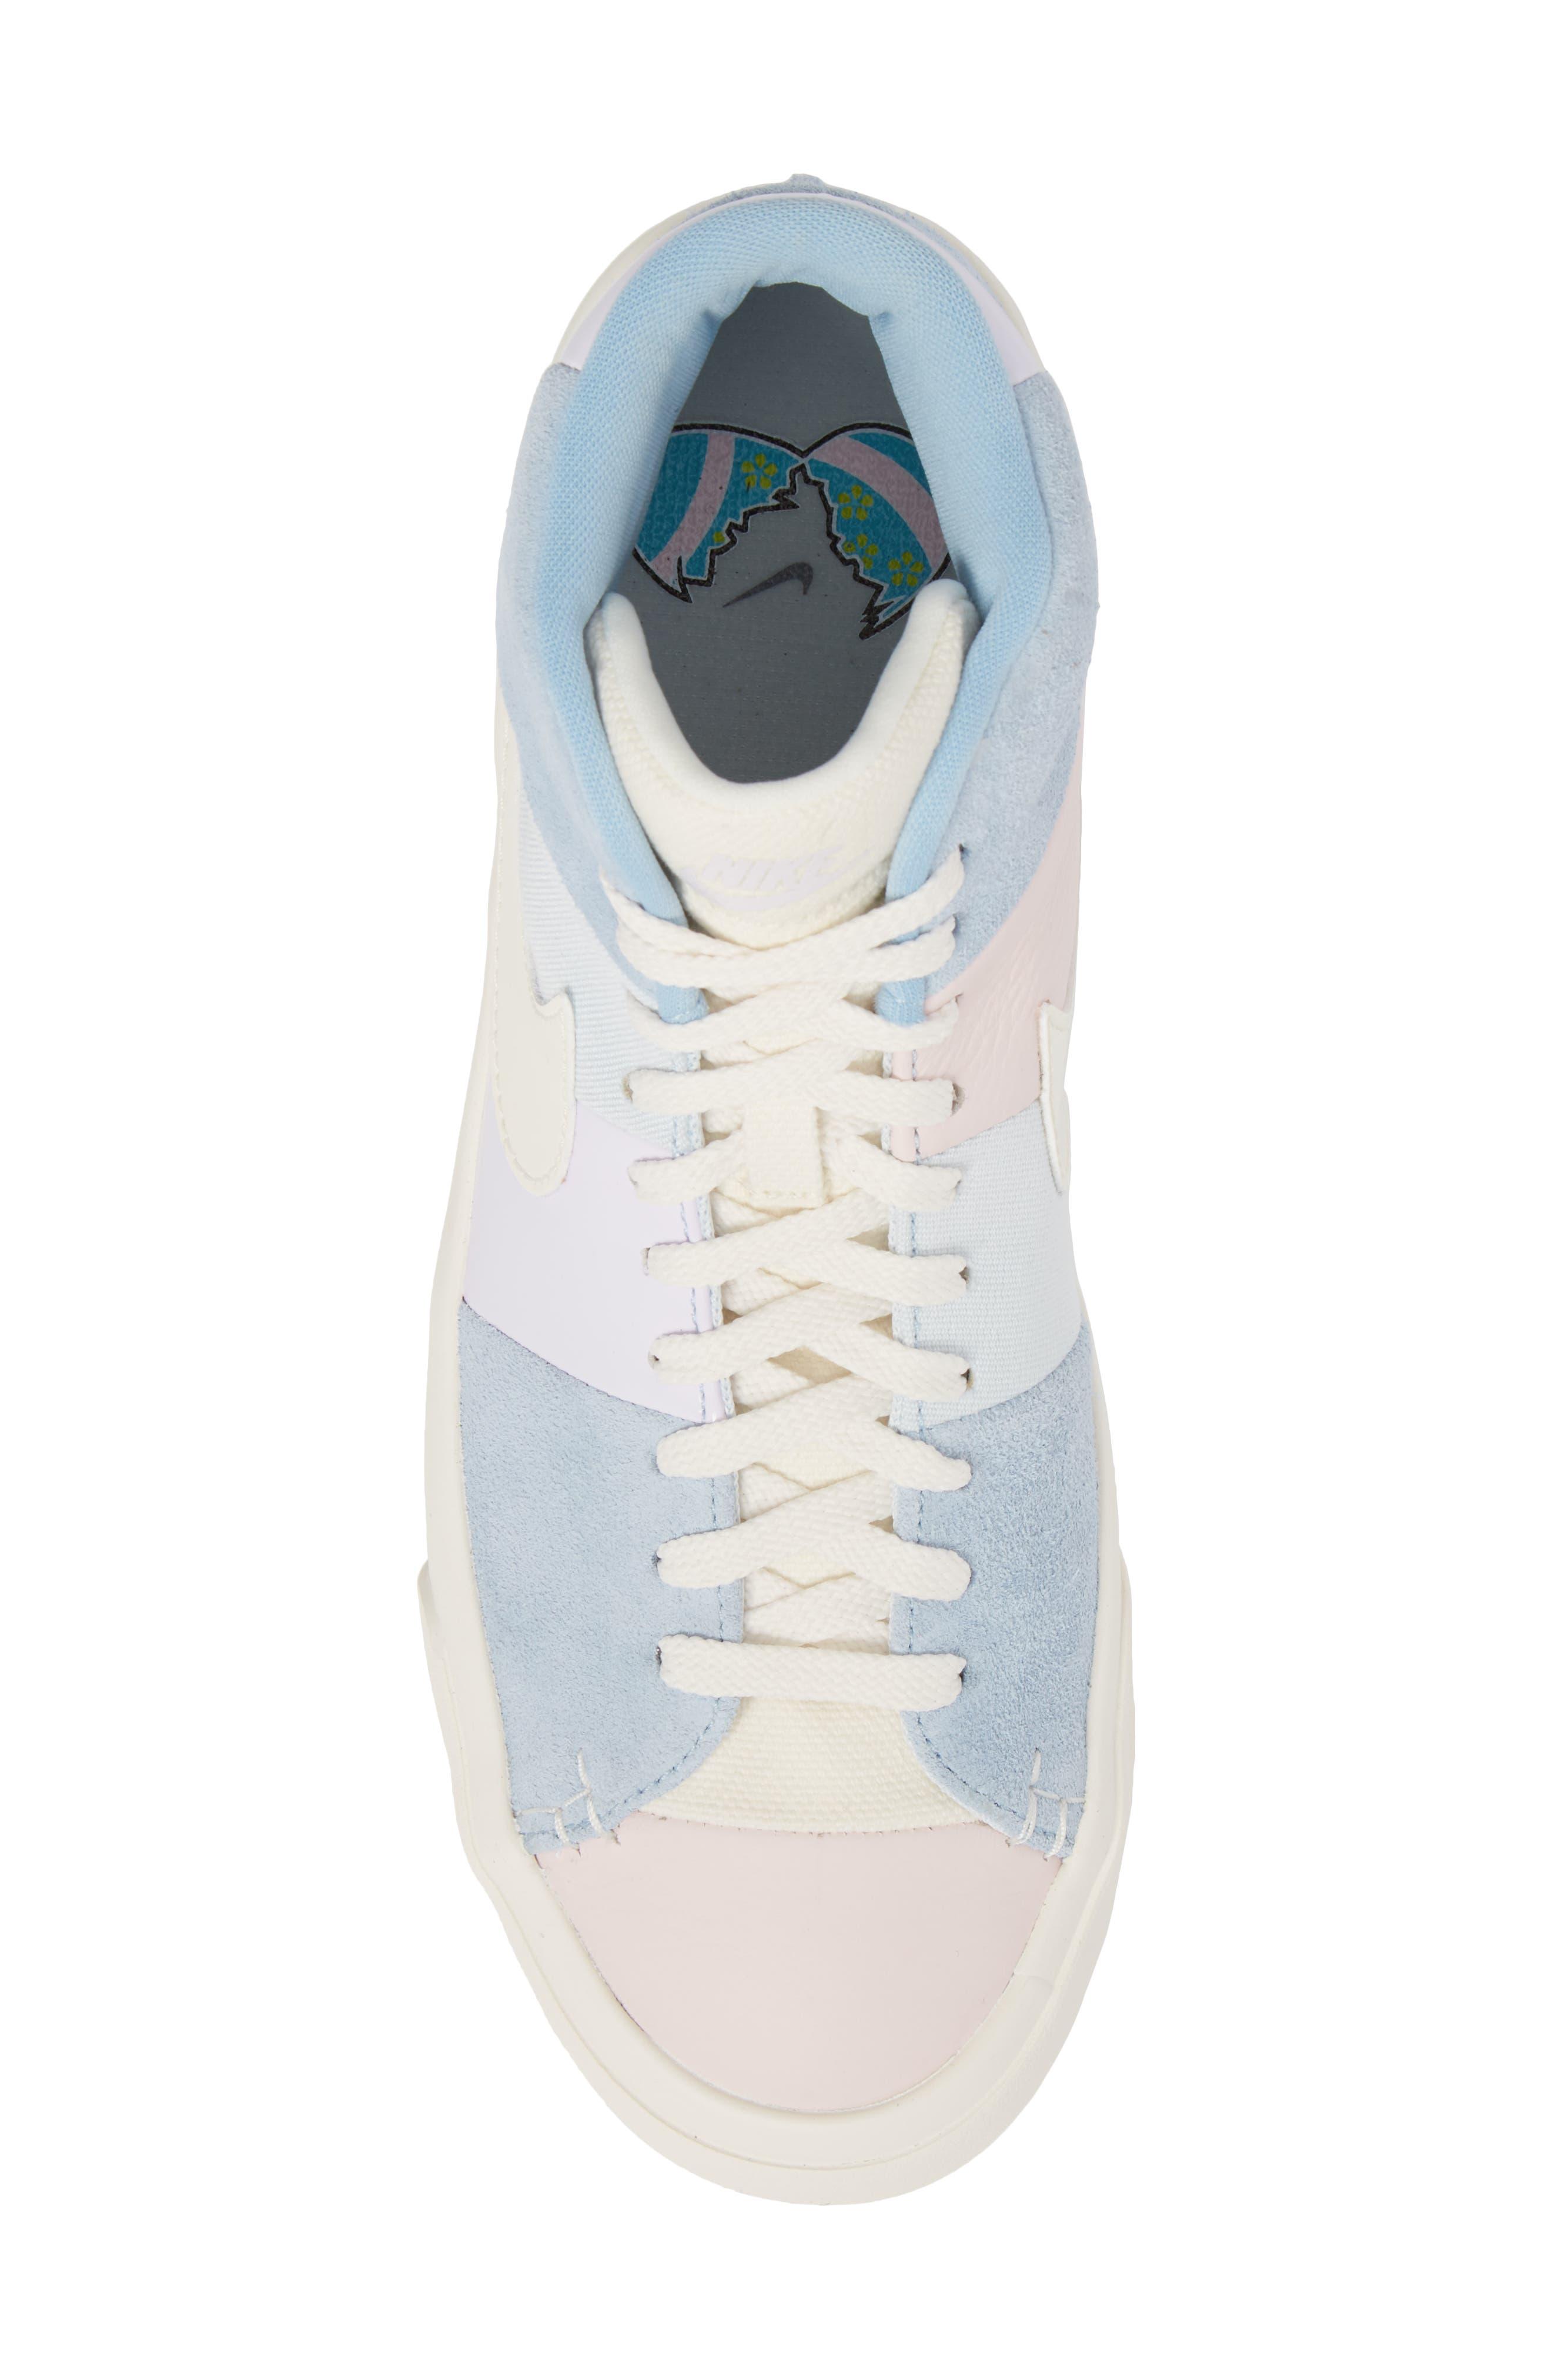 Blazer Royal Easter QS High Top Sneaker,                             Alternate thumbnail 5, color,                             650